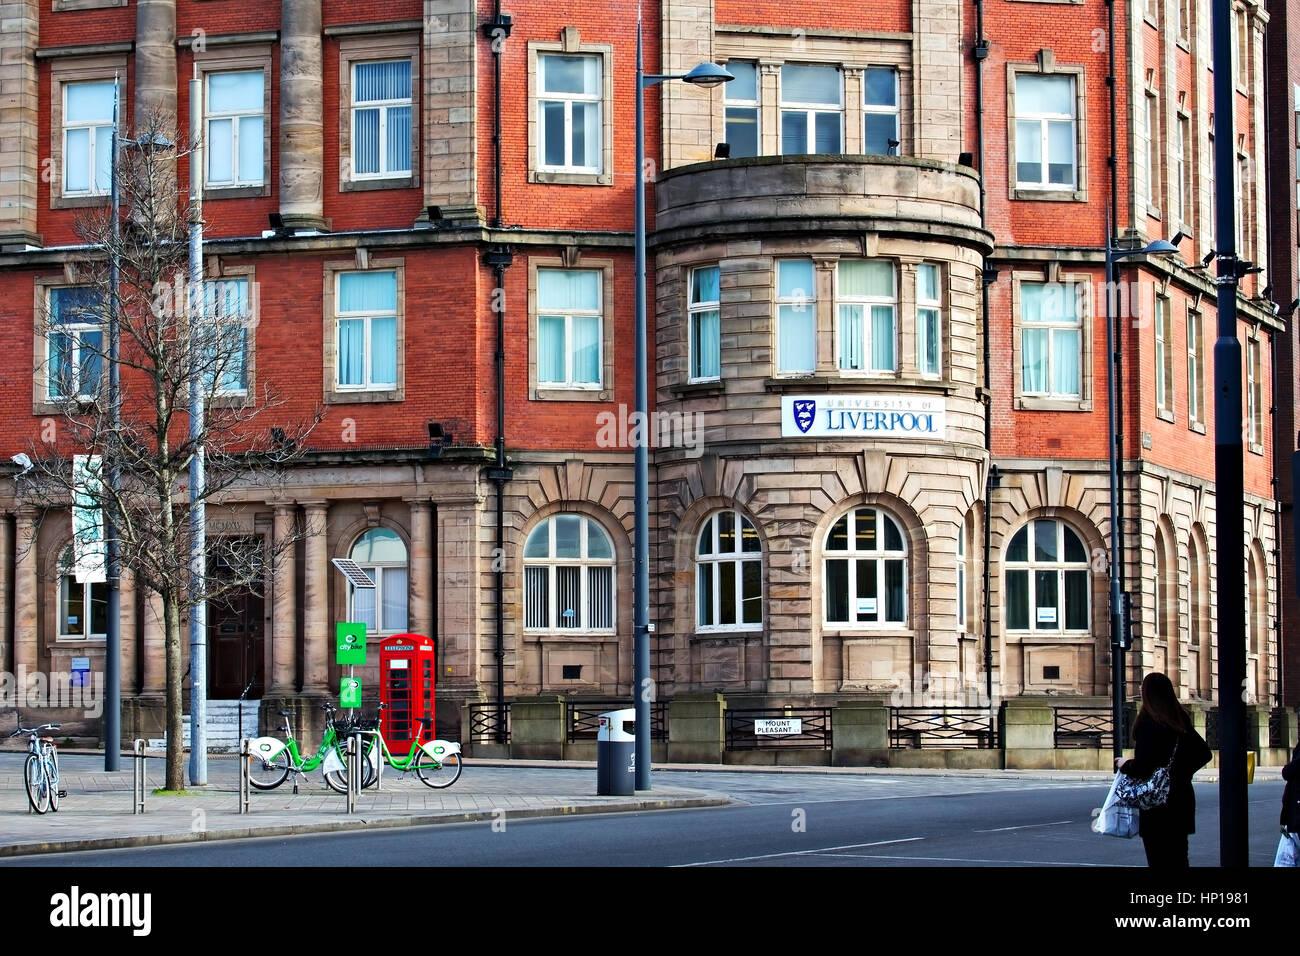 University of Liverpool building on Mount Pleasant Liverpool Merseyside United Kingdom - Stock Image